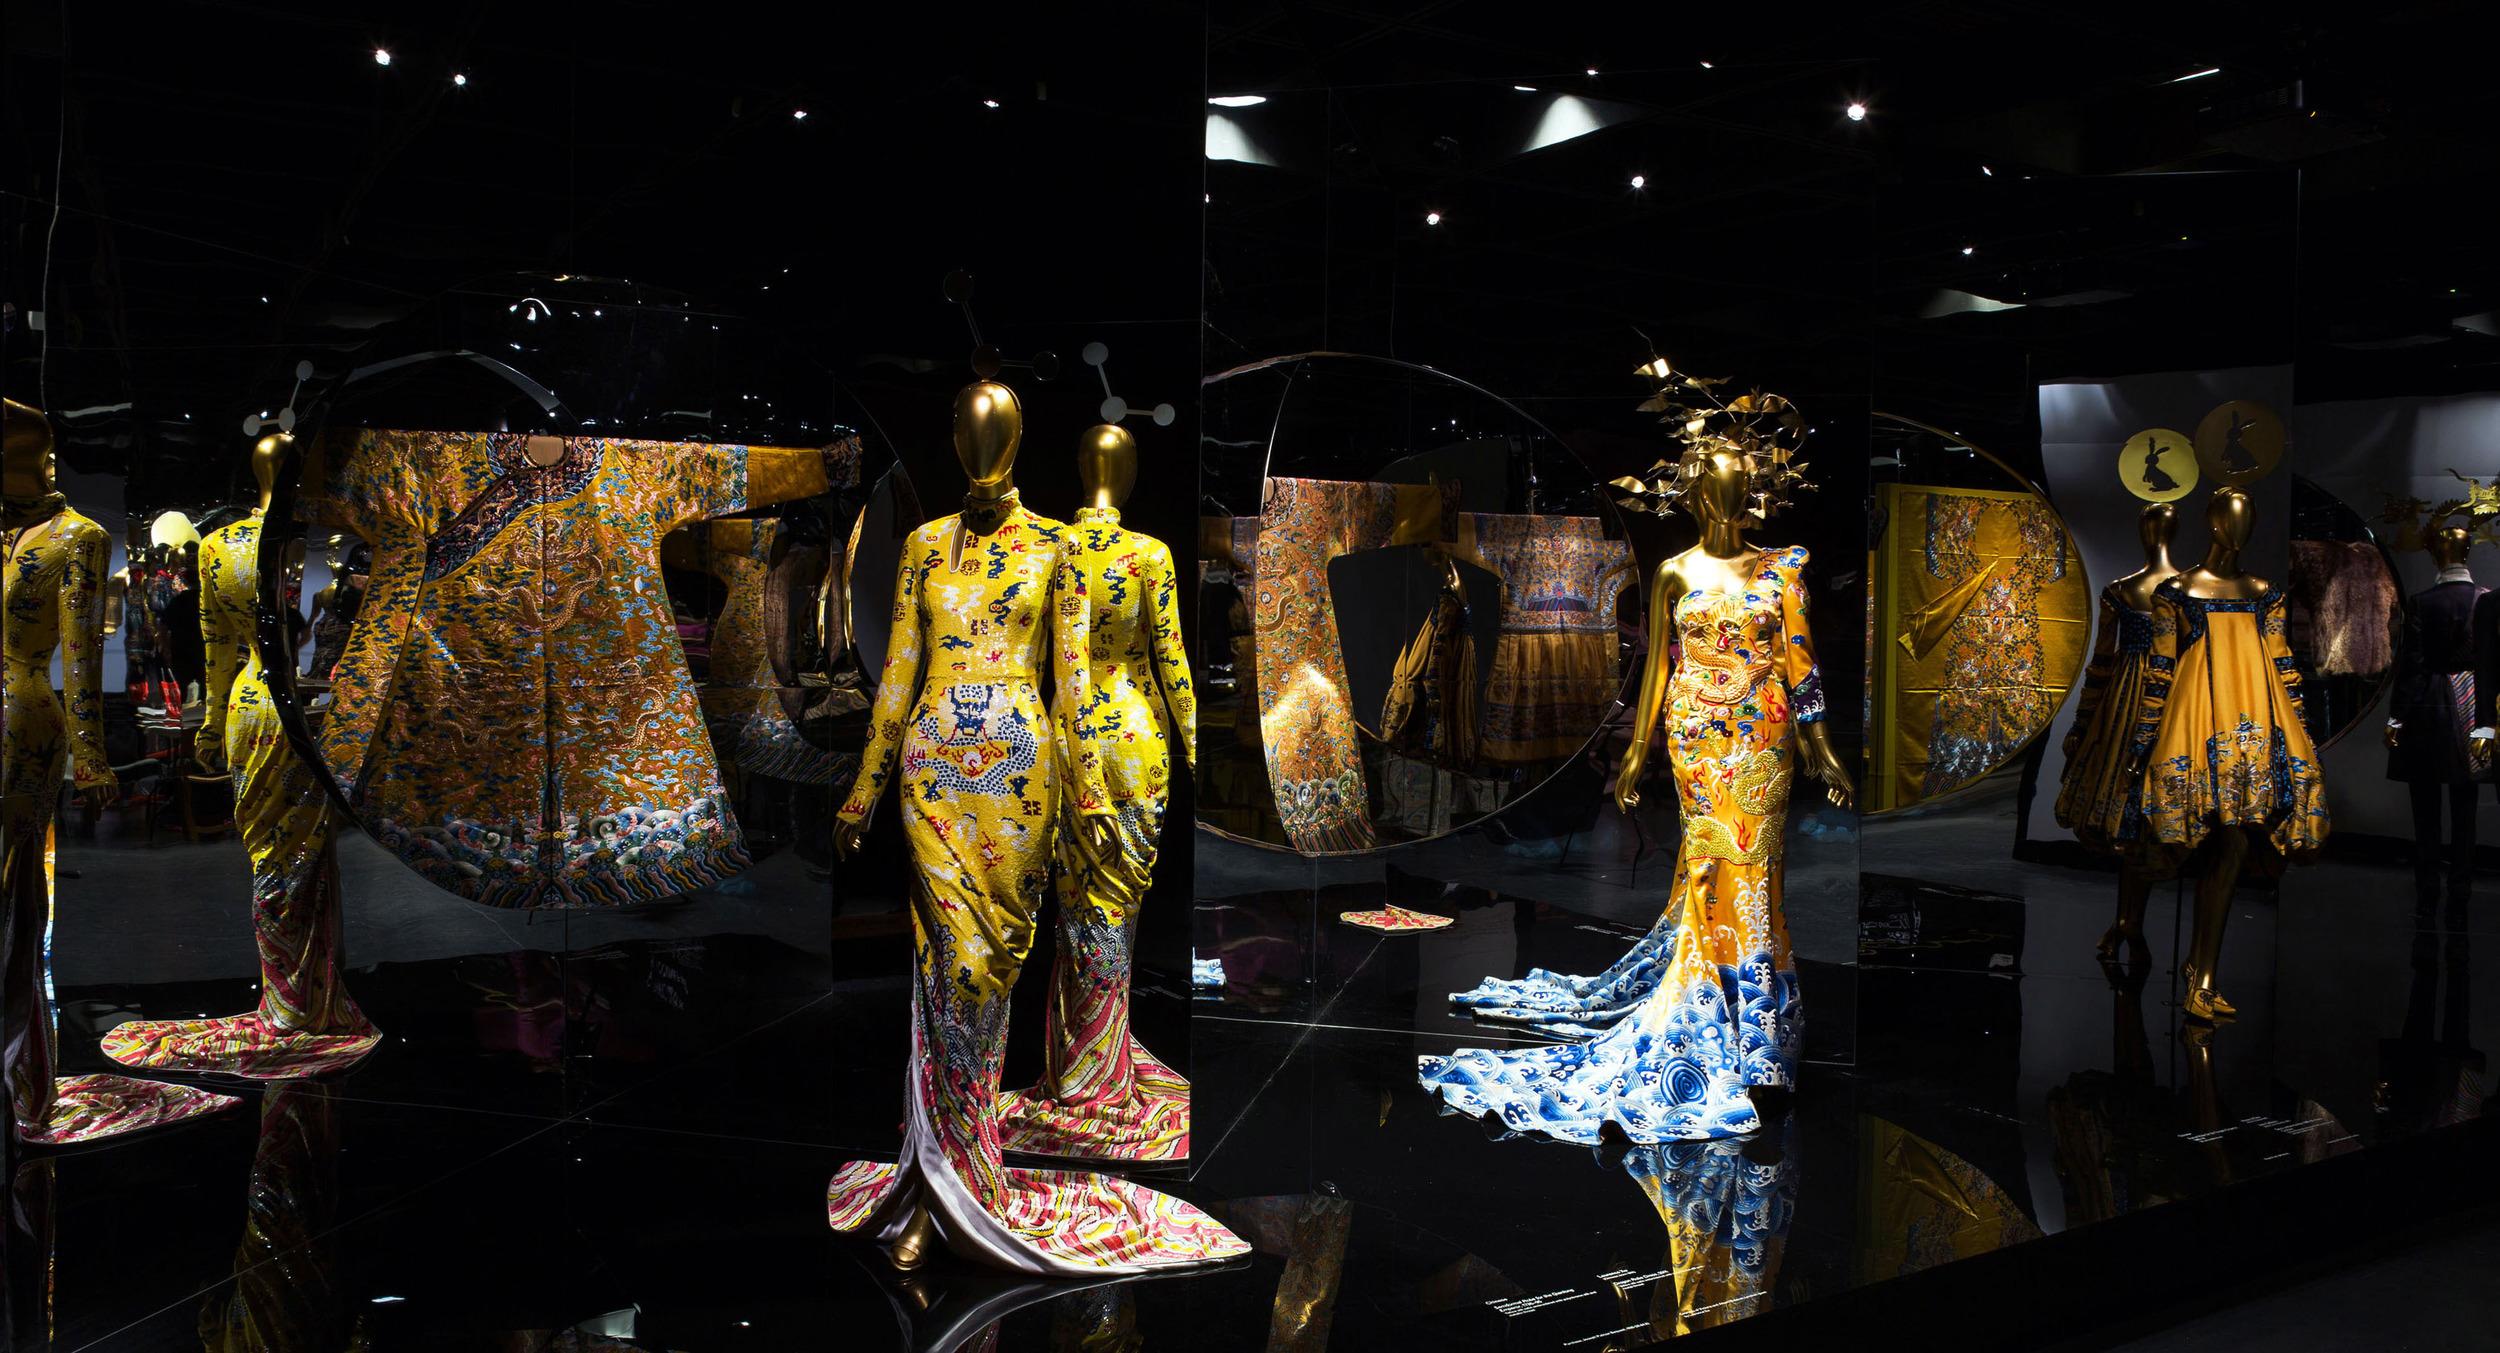 Anna Wintour Costume Center, Imperial China Photo: © The Metropolitan Museum of Art